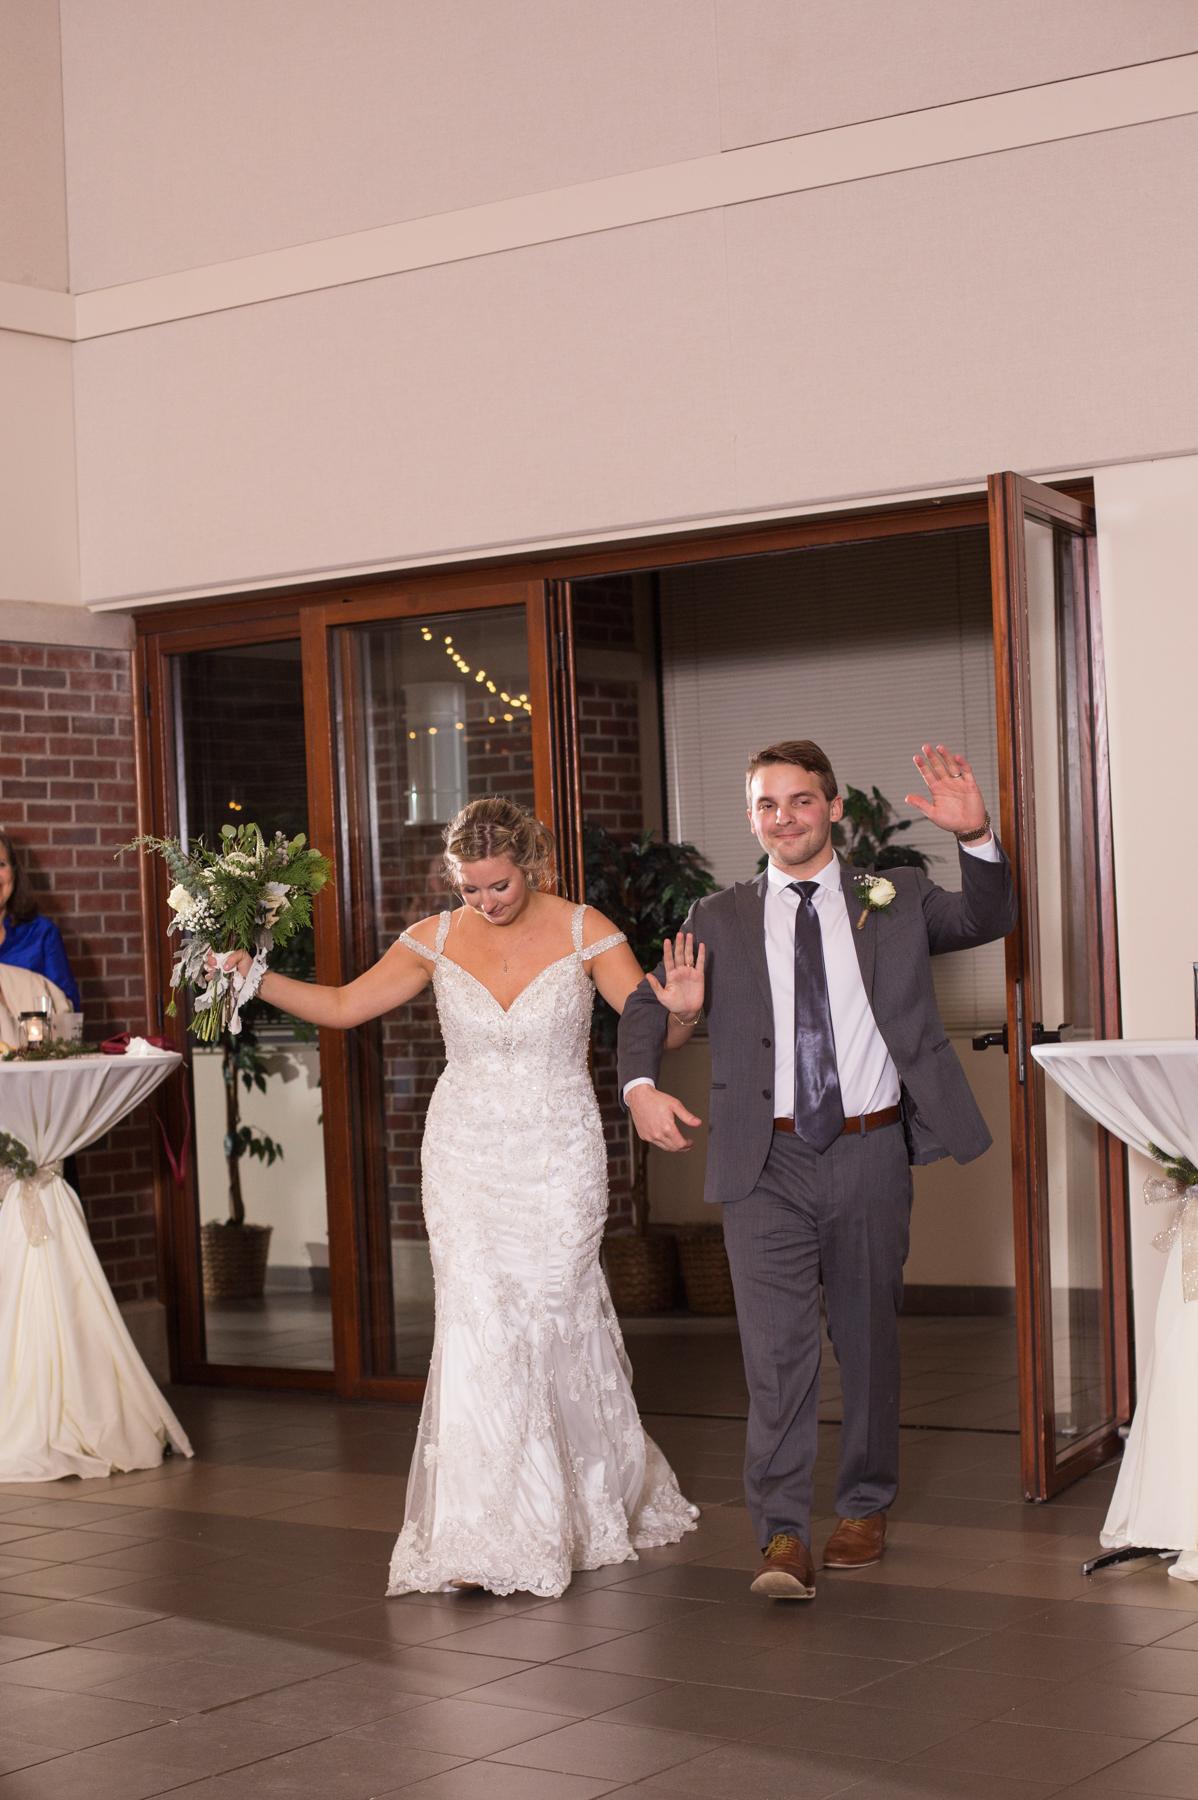 Kelli-and-Matt-Nashville-Wedding-Sneak-Peak-0265.jpg